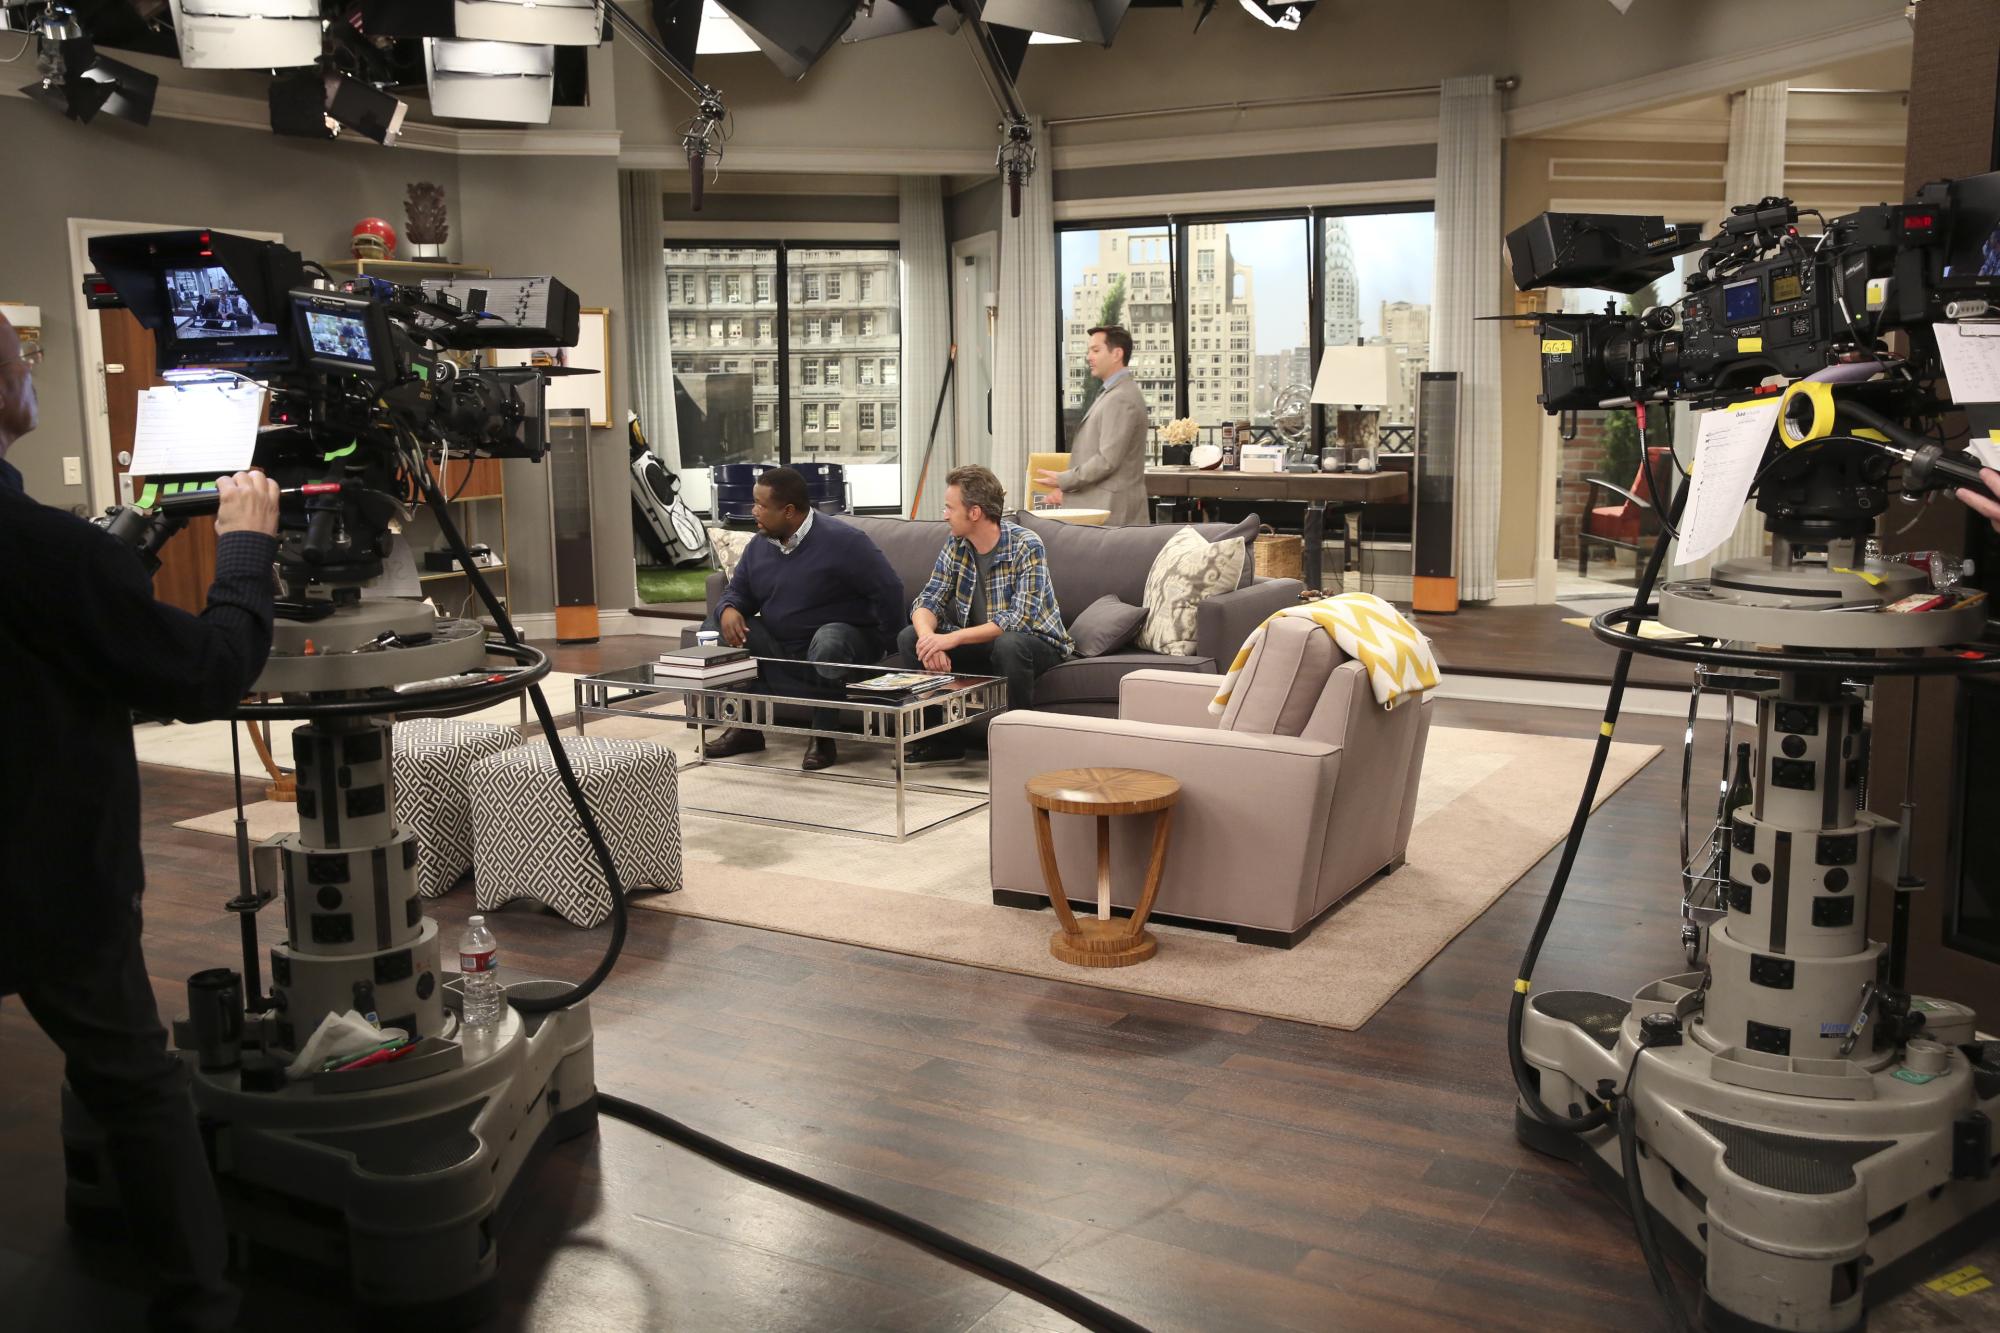 Actors on set